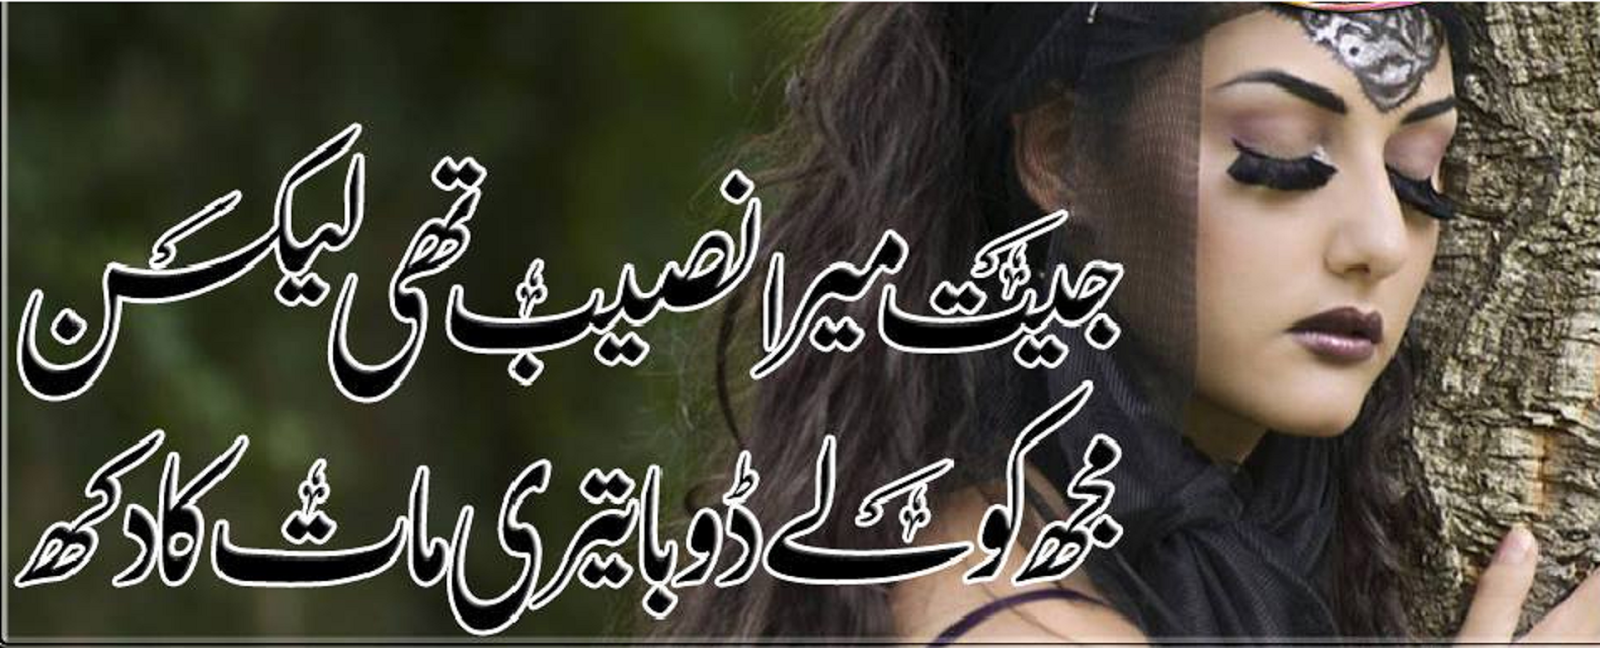 Download HD Wallpapers 3D Beautiful Sad Urdu Poetry HD 1600x648